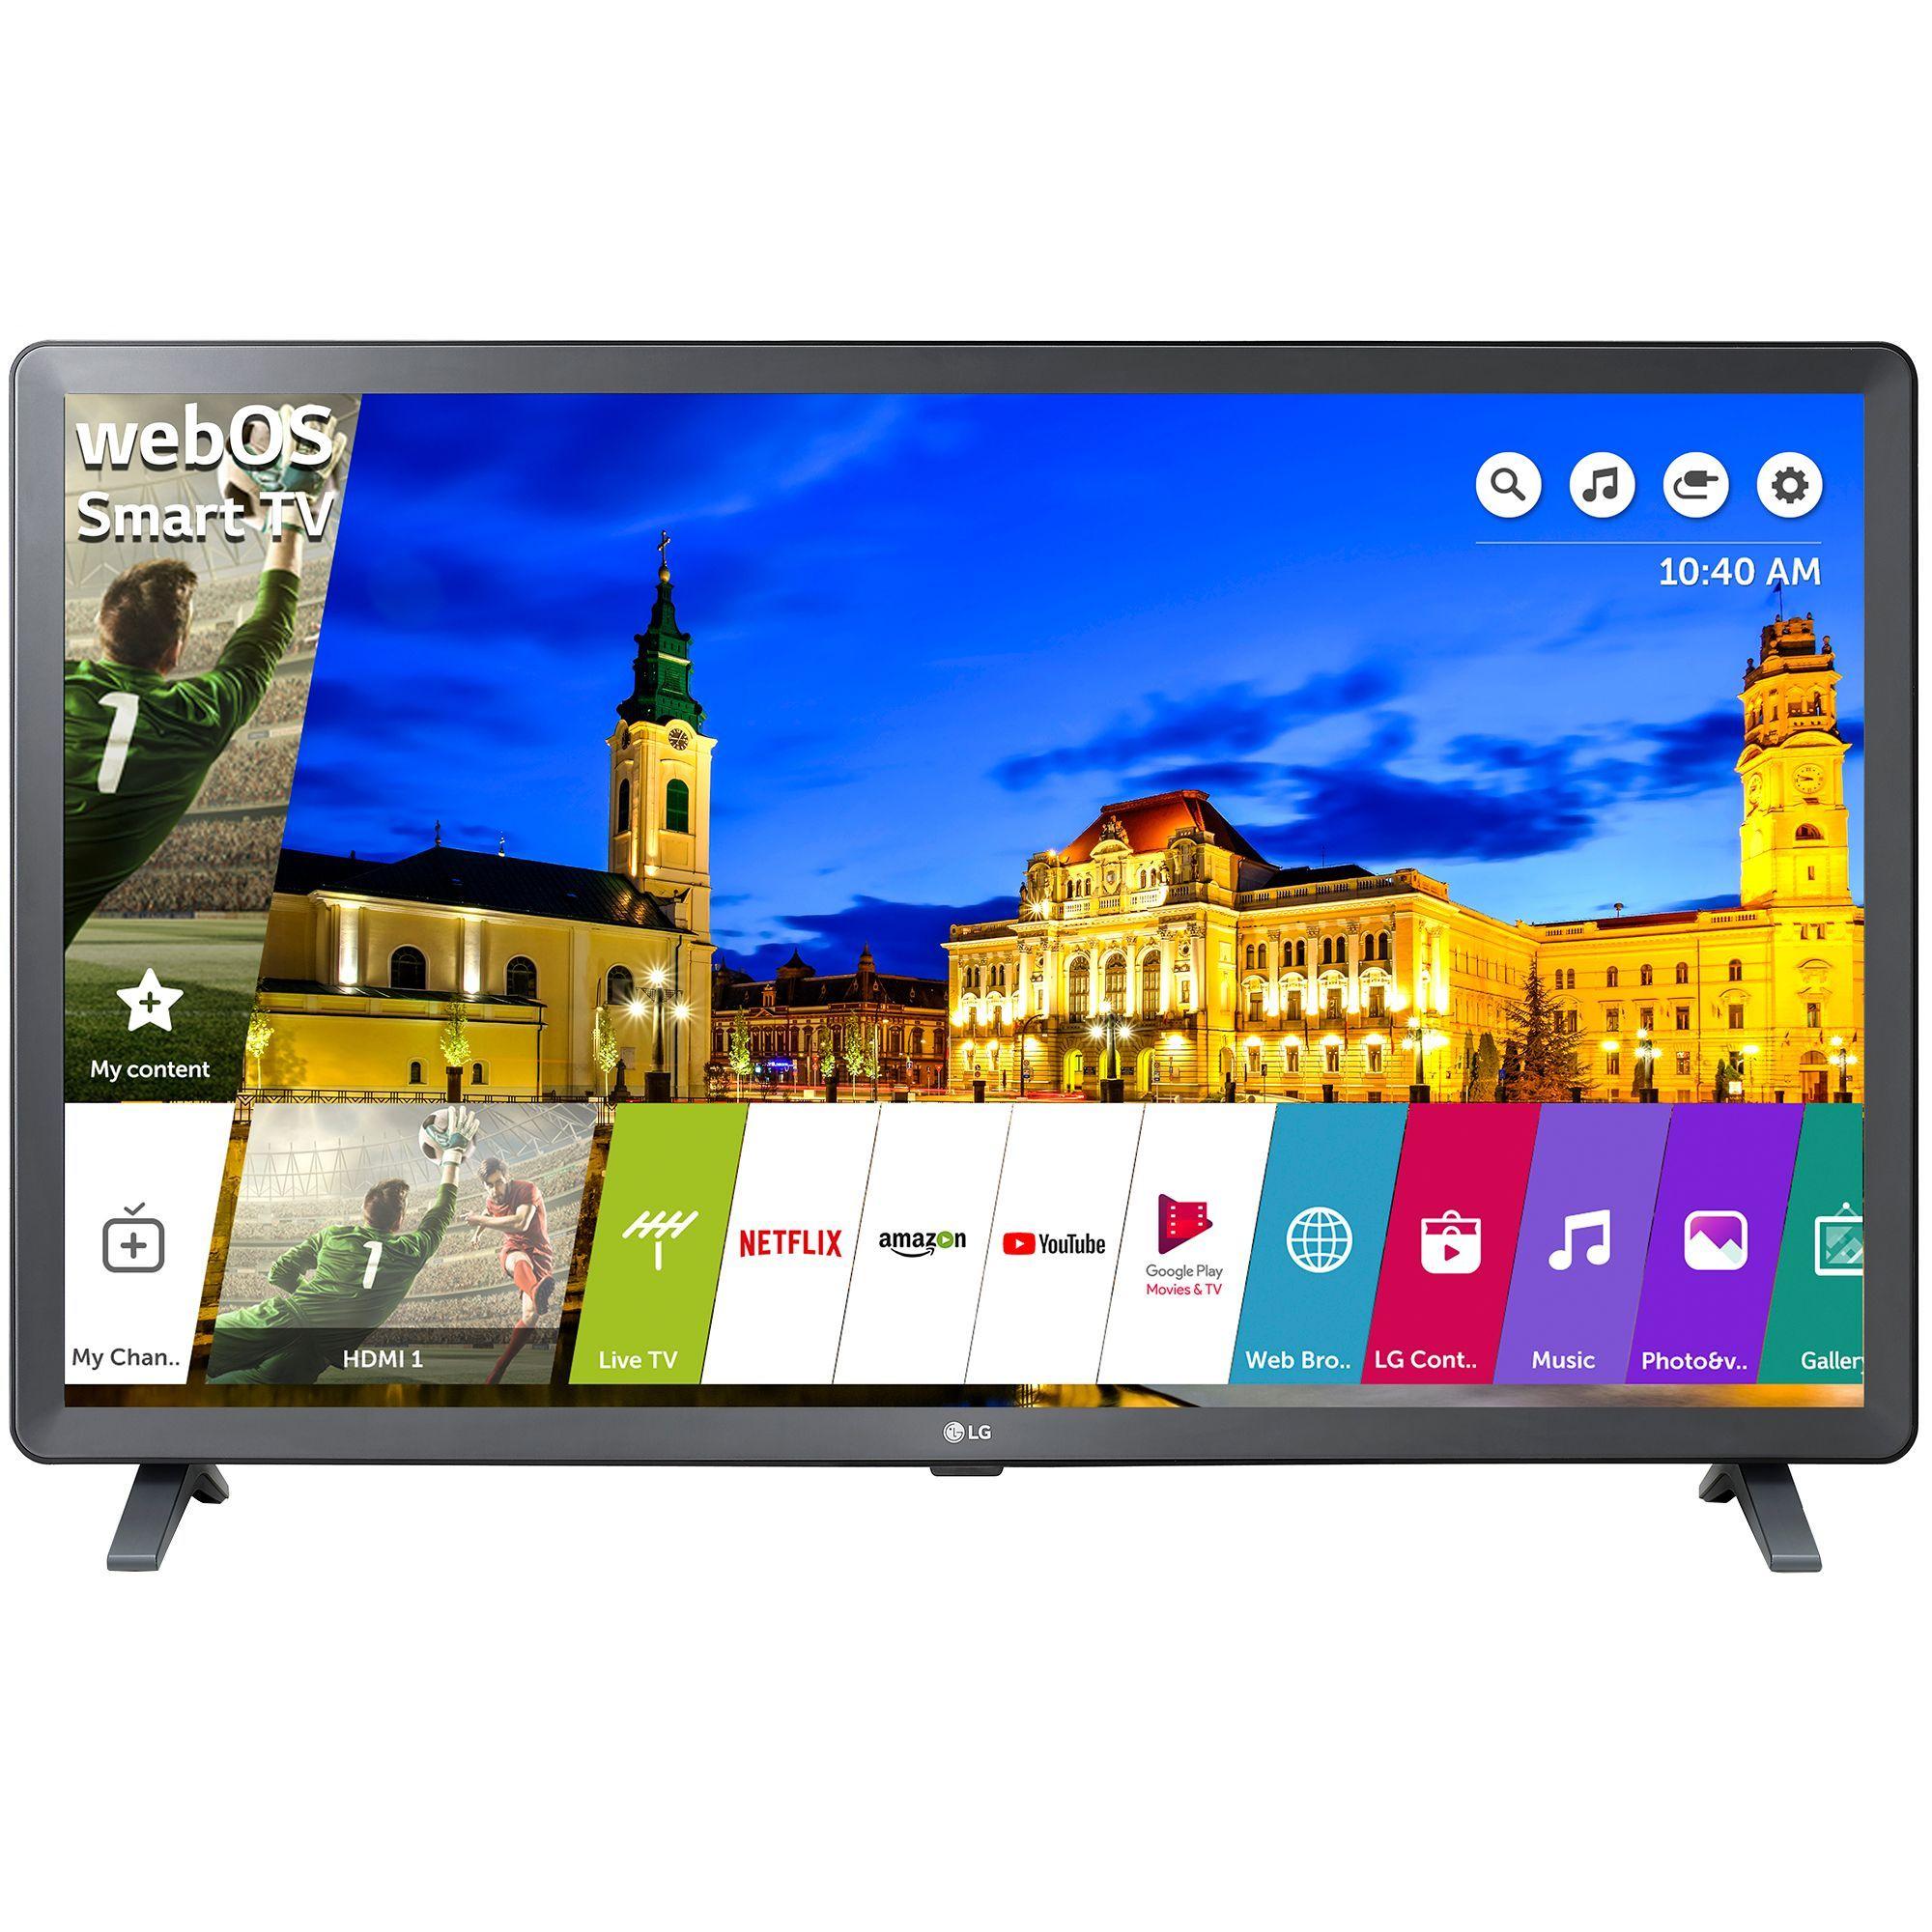 LG 32LK6100PLB 32 Full HD Smart TV WiFi LED